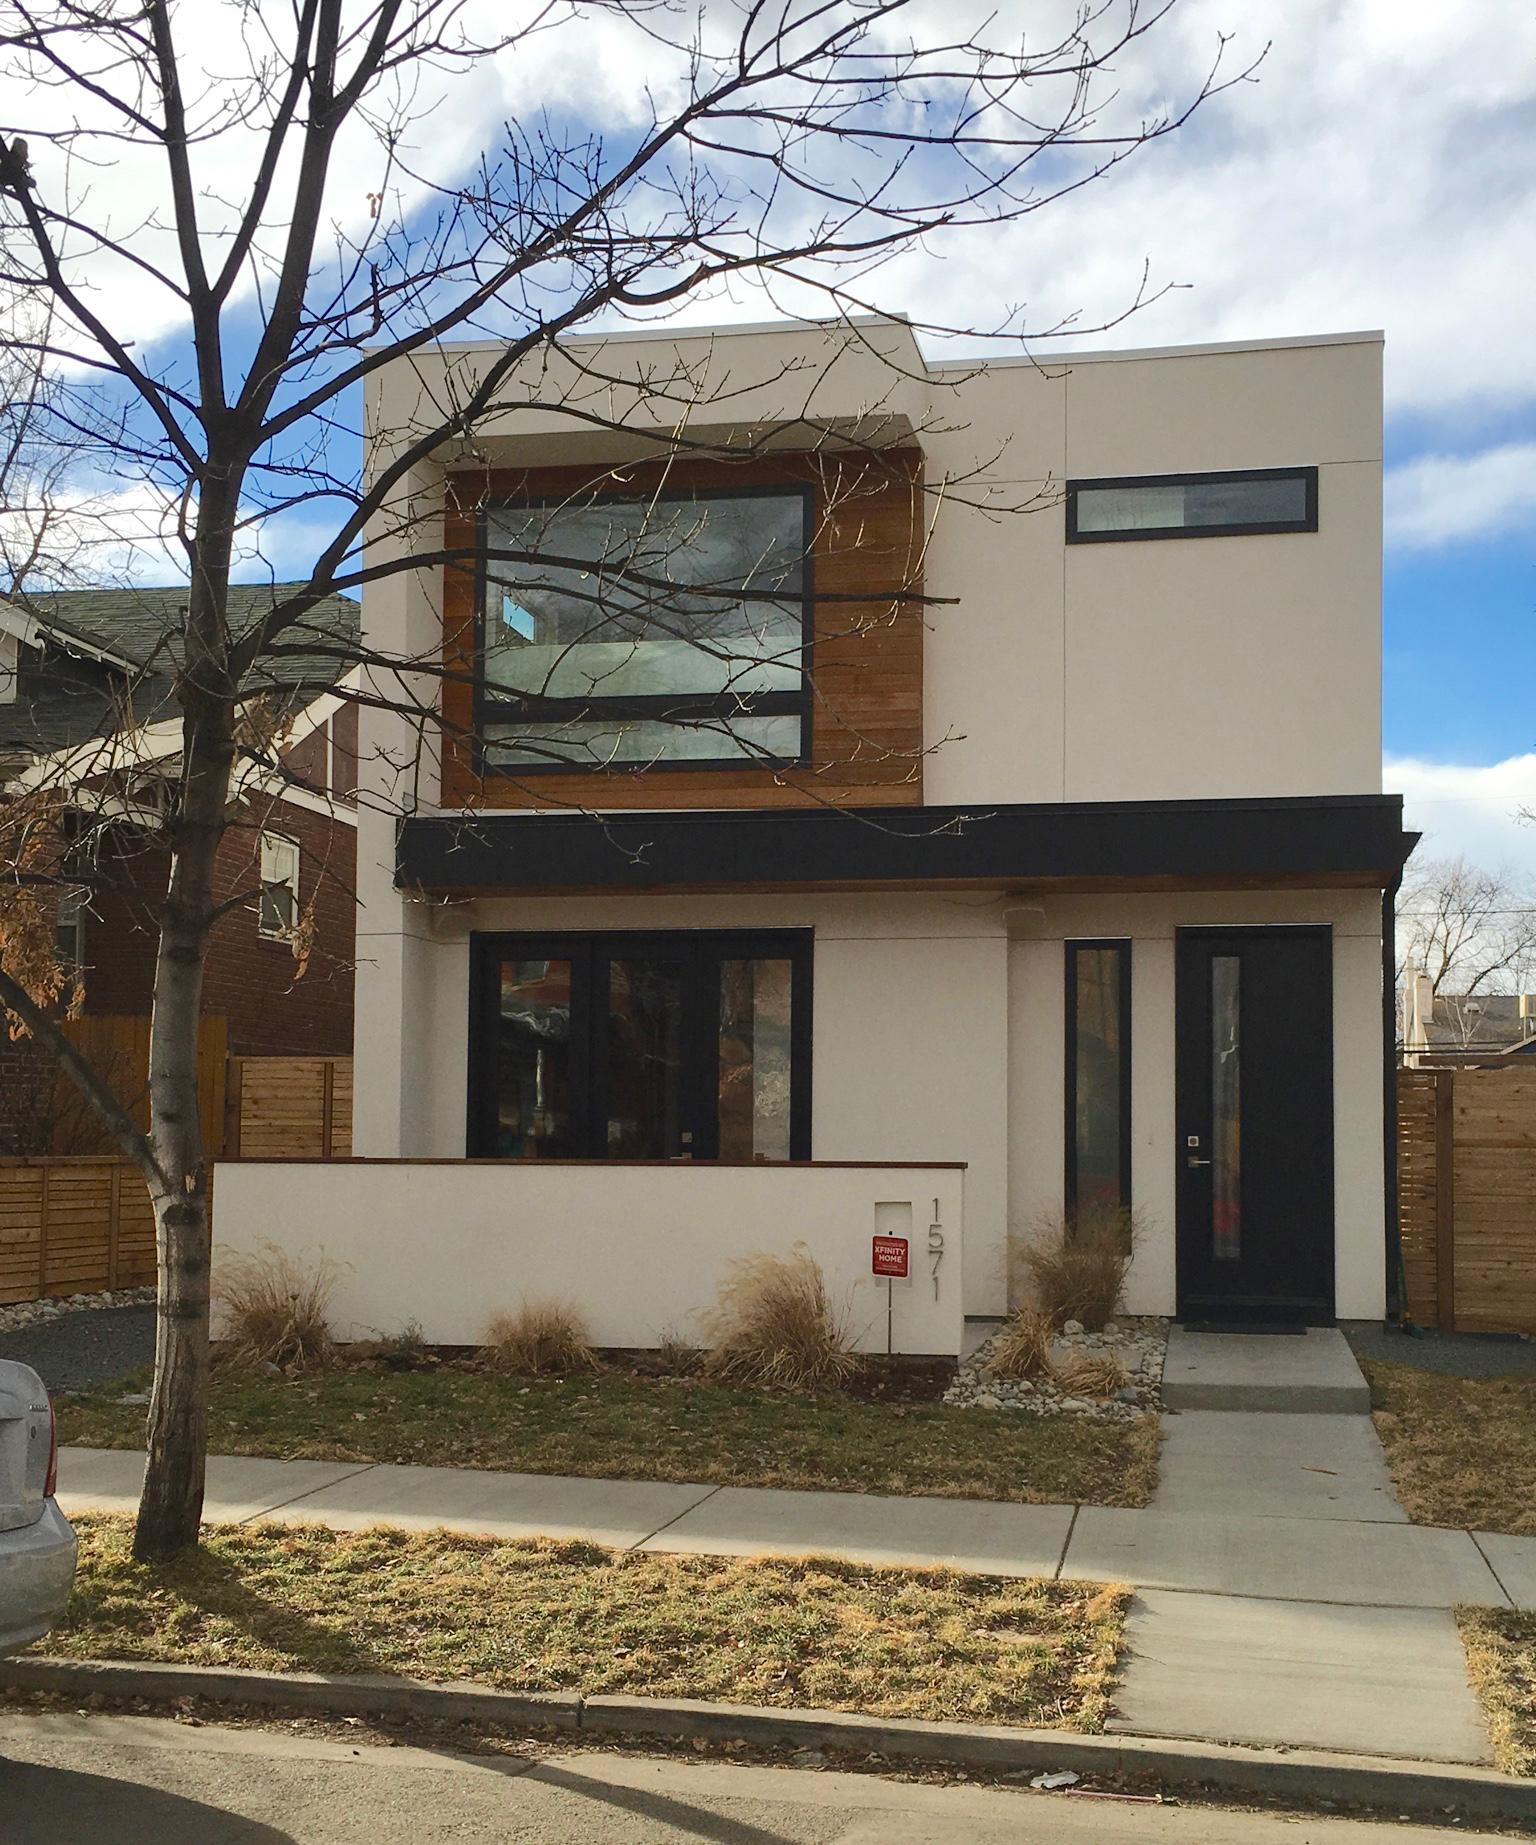 New Modernist Home - standing apart